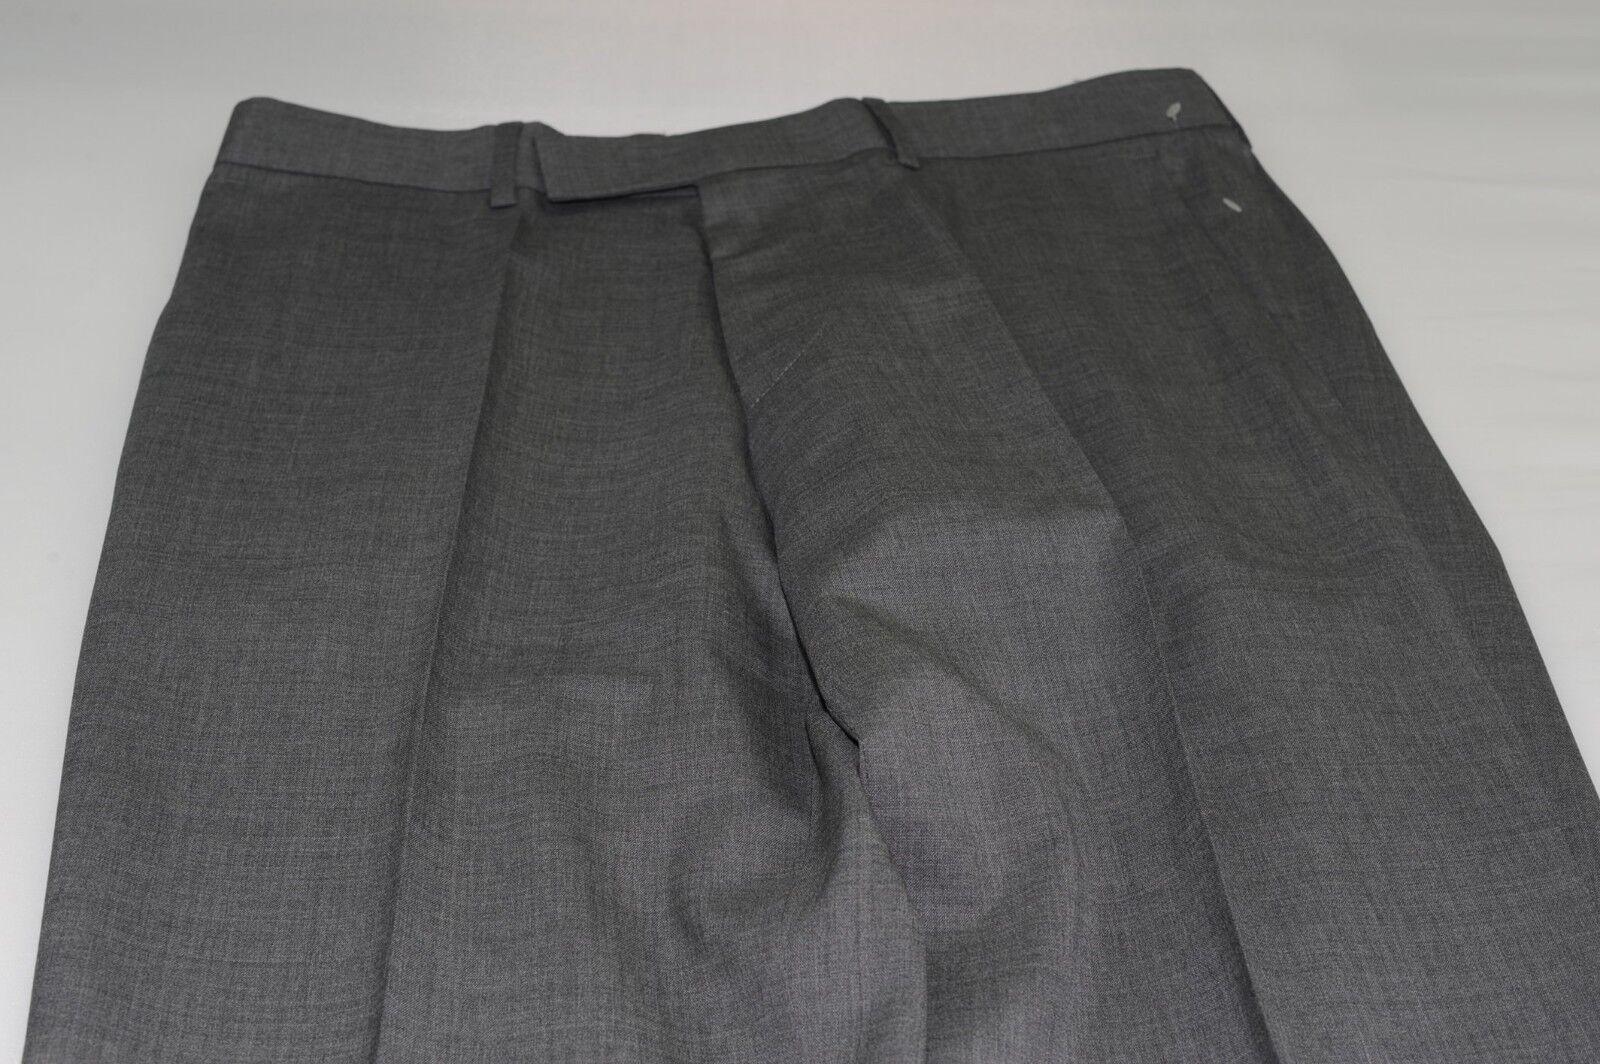 NWOT Hugo Boss C-Pasini C-Movie Flat Front Wool Dress Pants Waist 34 (38S)